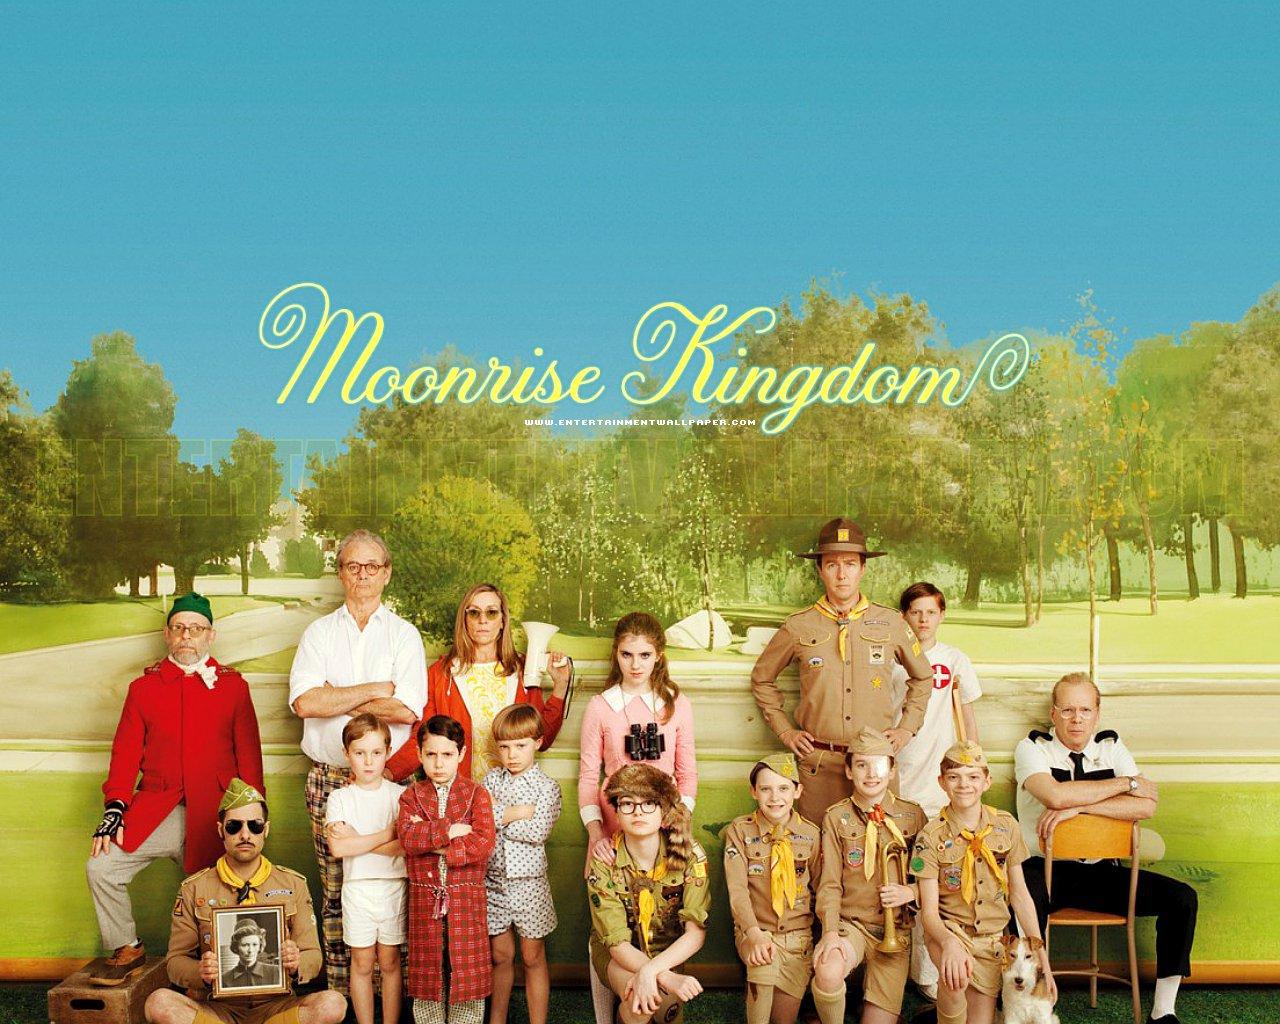 Top 10(ish) films of 2012: Part 1